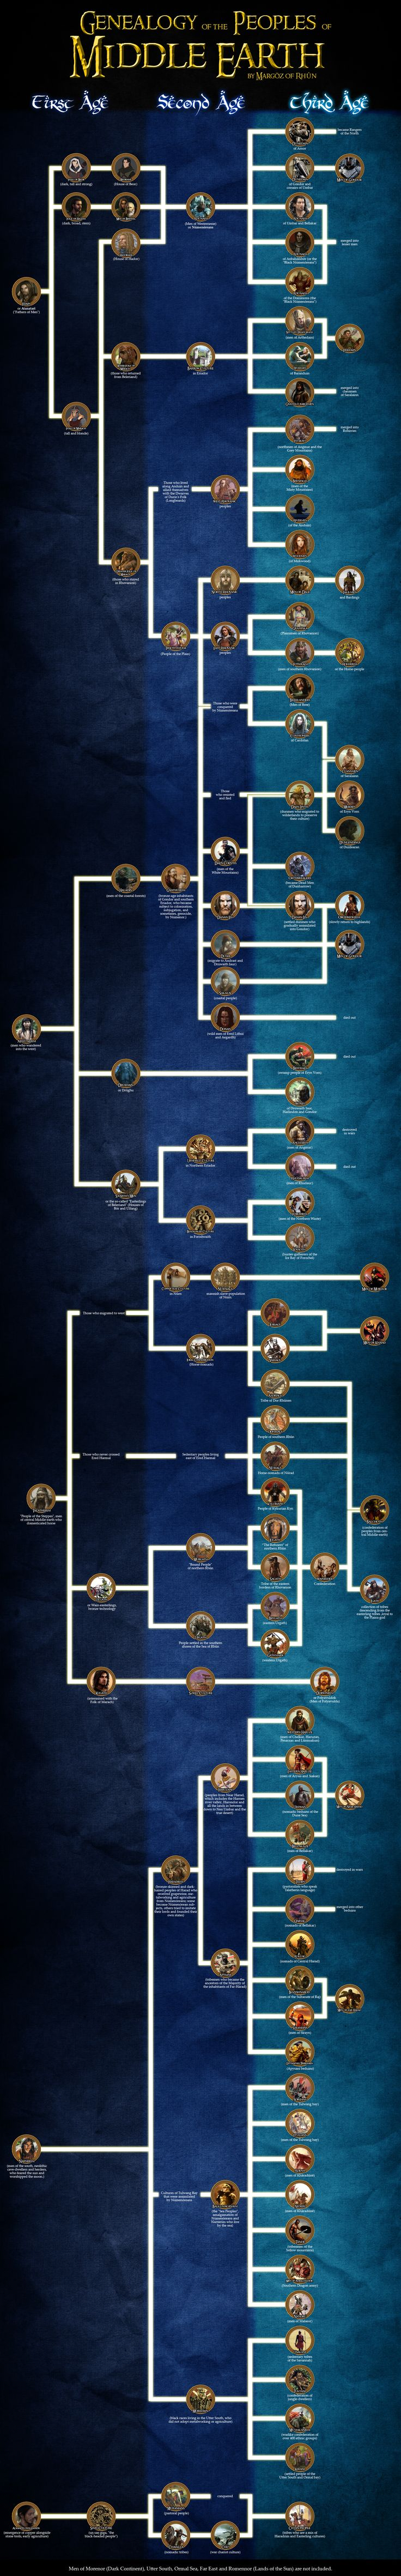 Genealogy of the peoples of Middle Earth by enanoakd.deviantart.com on @DeviantArt